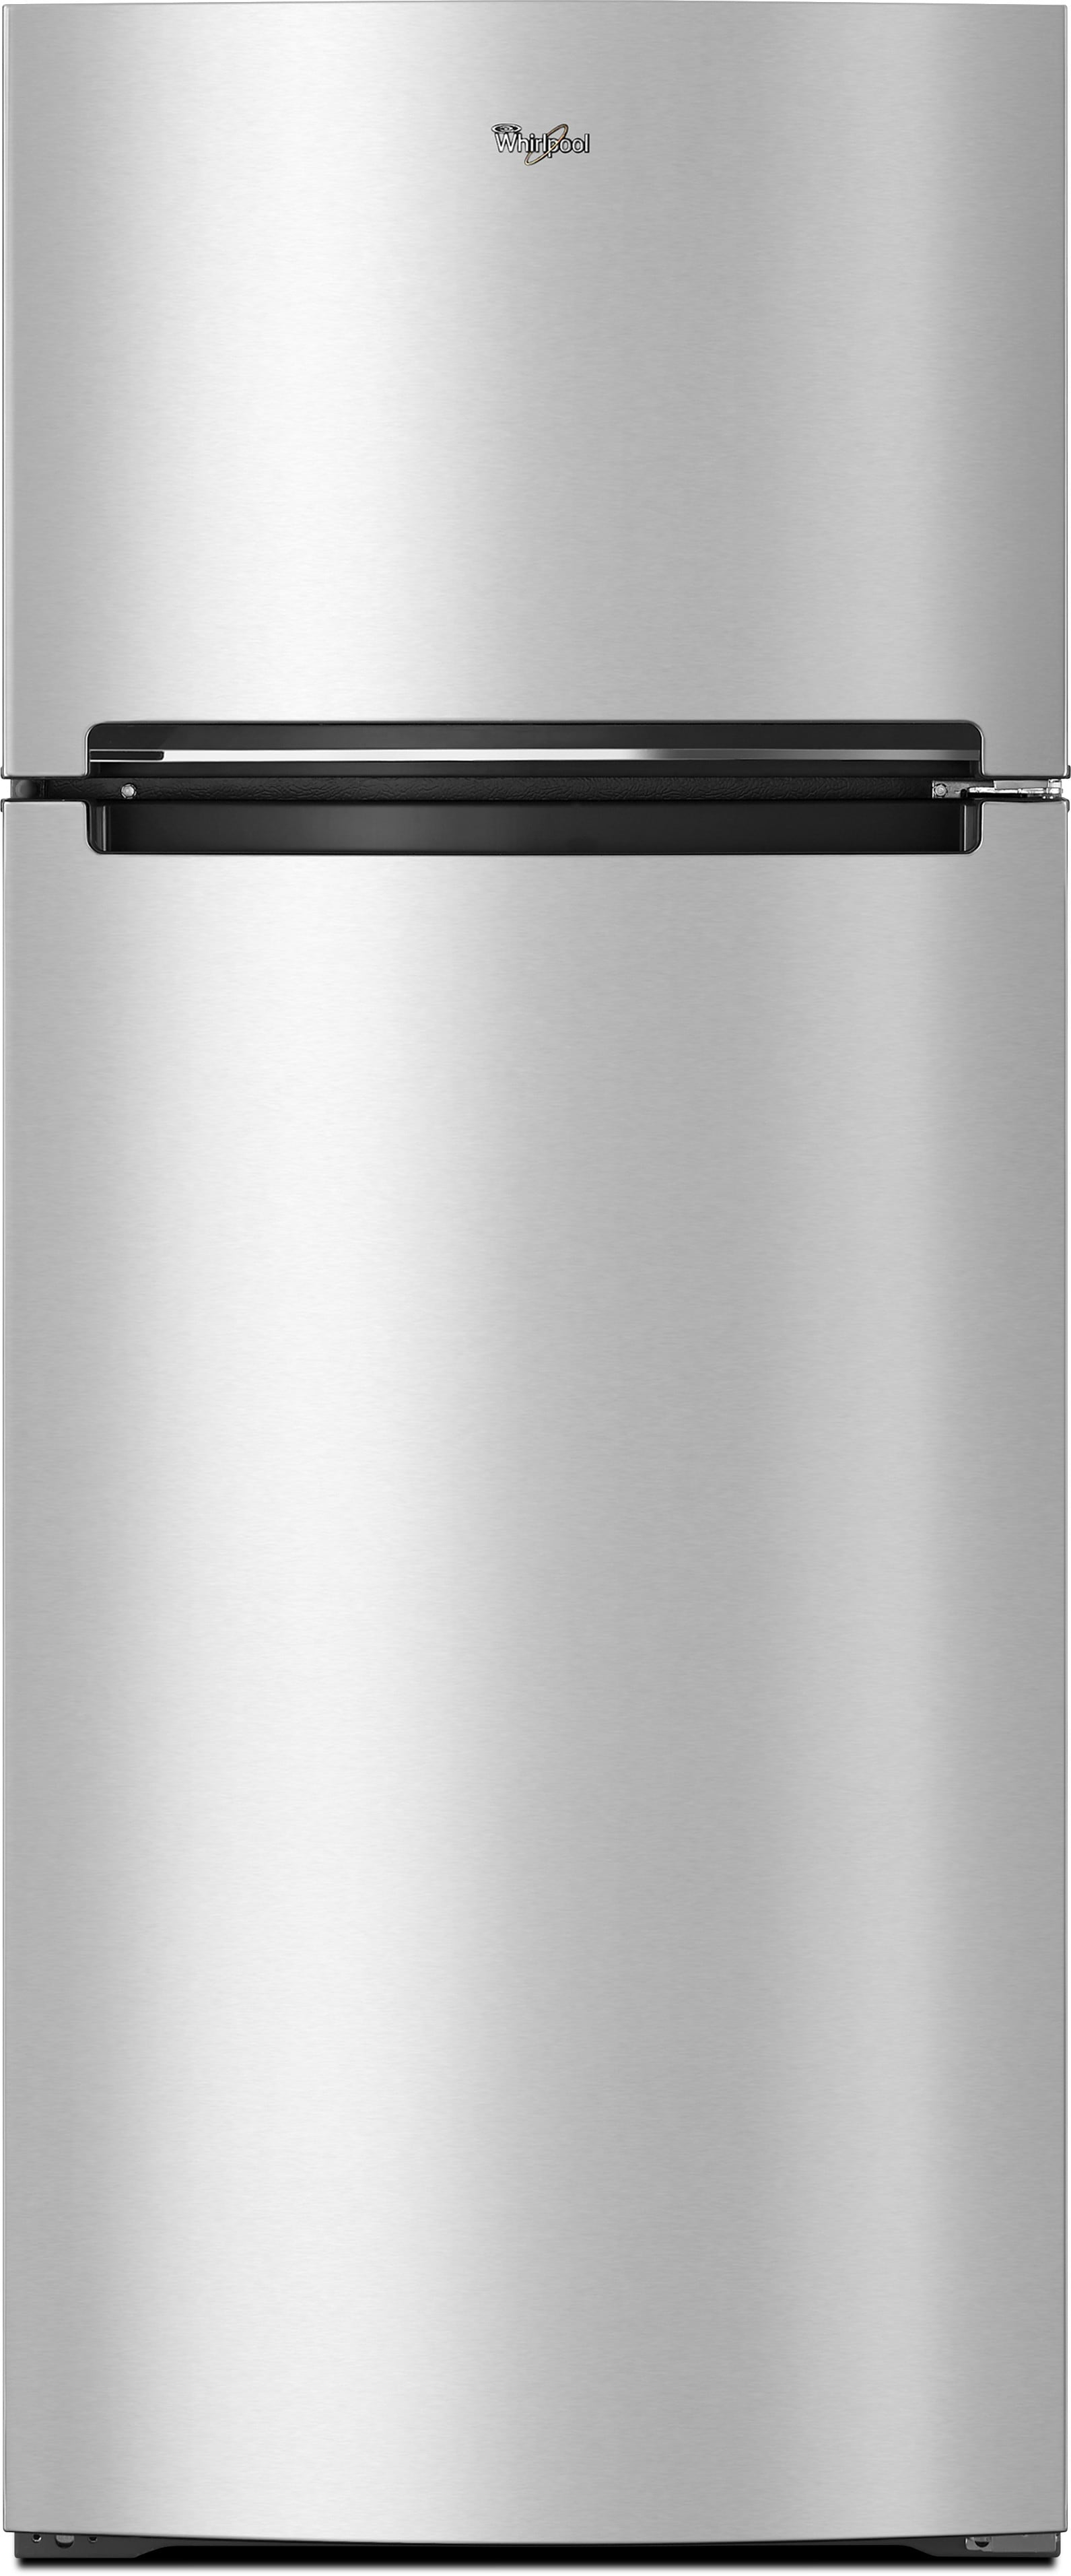 Whirlpool Wrt518szfg 28 Inch Top Freezer Refrigerator With